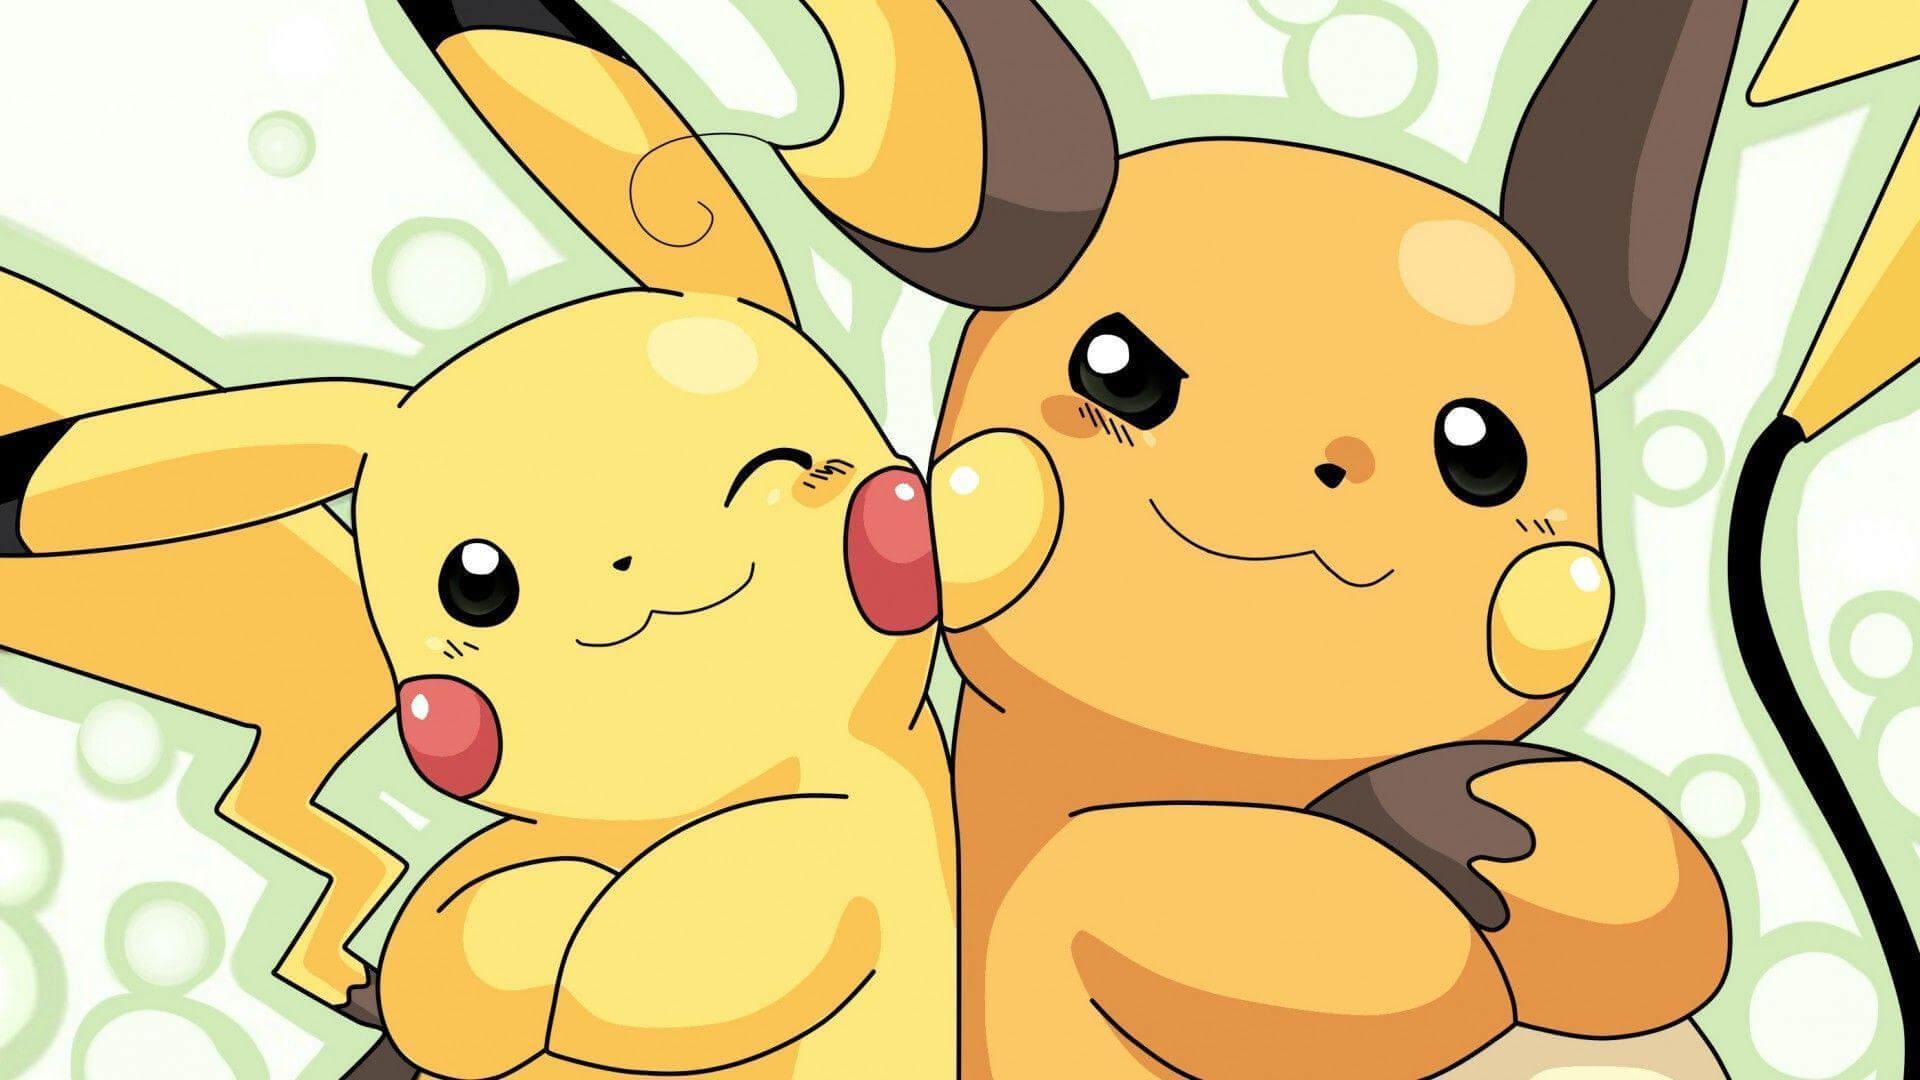 Pikachu (left) evolves to Raichu (right)